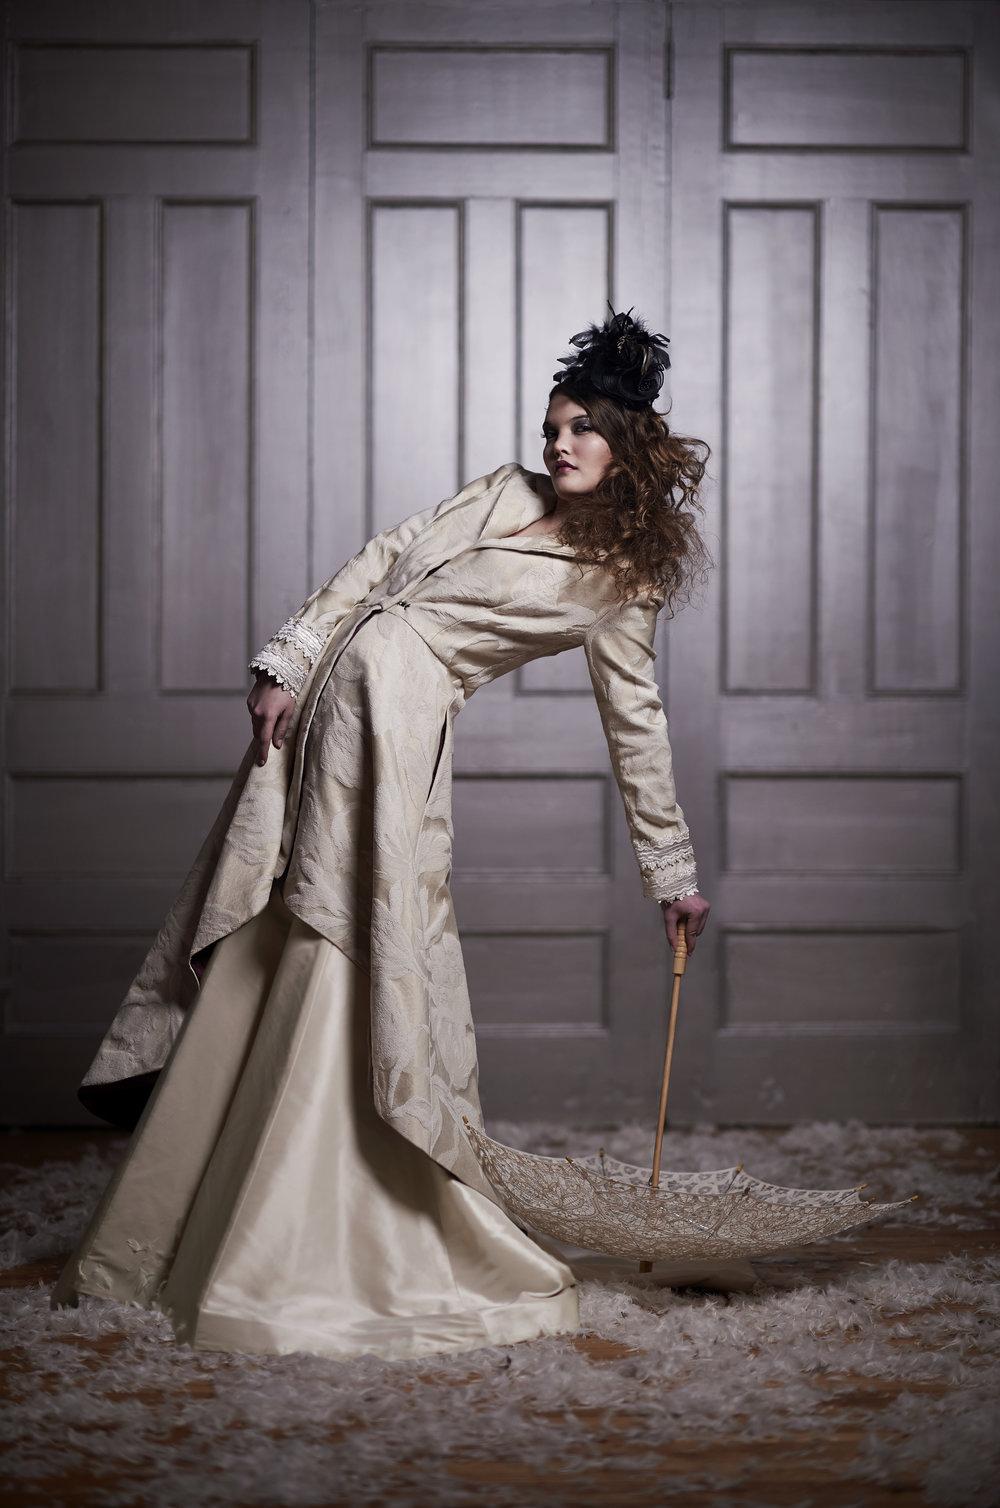 marta-hewson-fashion-urnabicity-bridal-victorian-umbrella.jpg